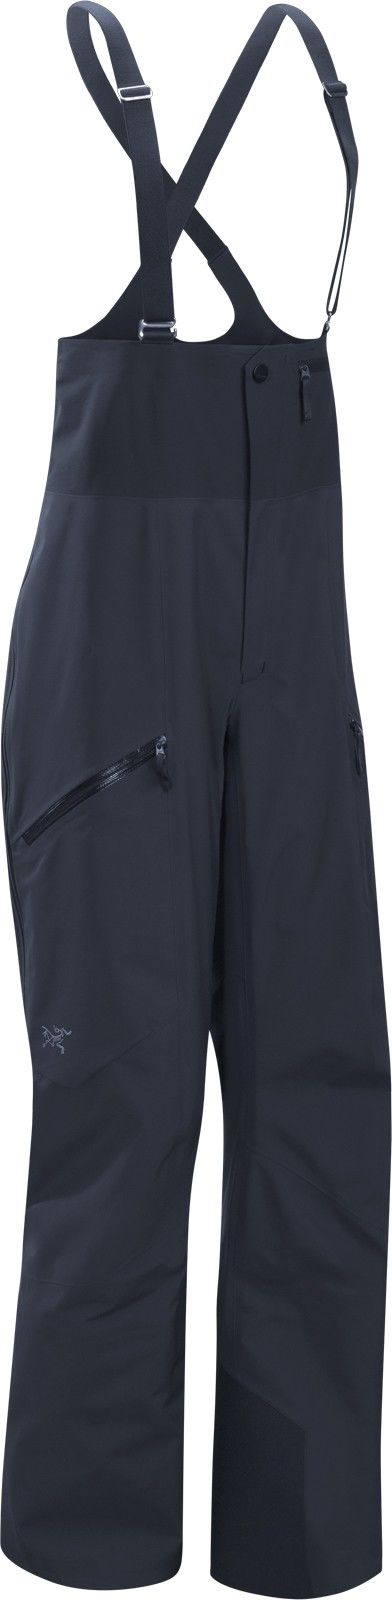 Arcteryx Shashka Pant Blau, Female Gore-Tex® Hose, L